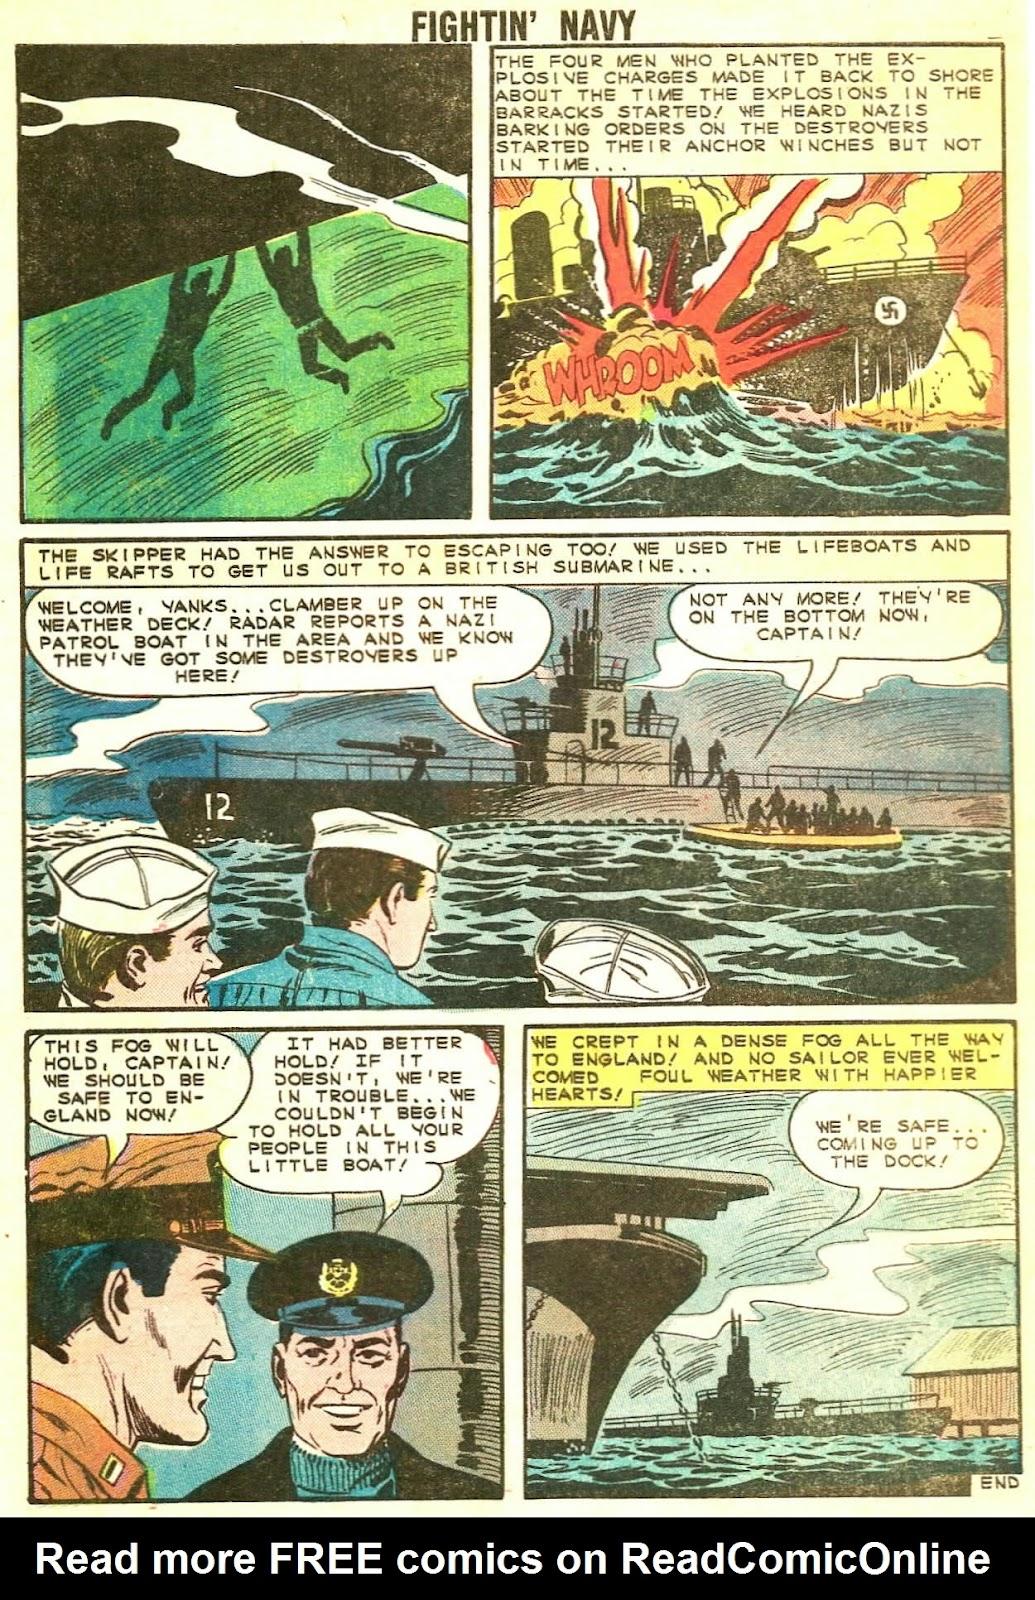 Read online Fightin' Navy comic -  Issue #115 - 8